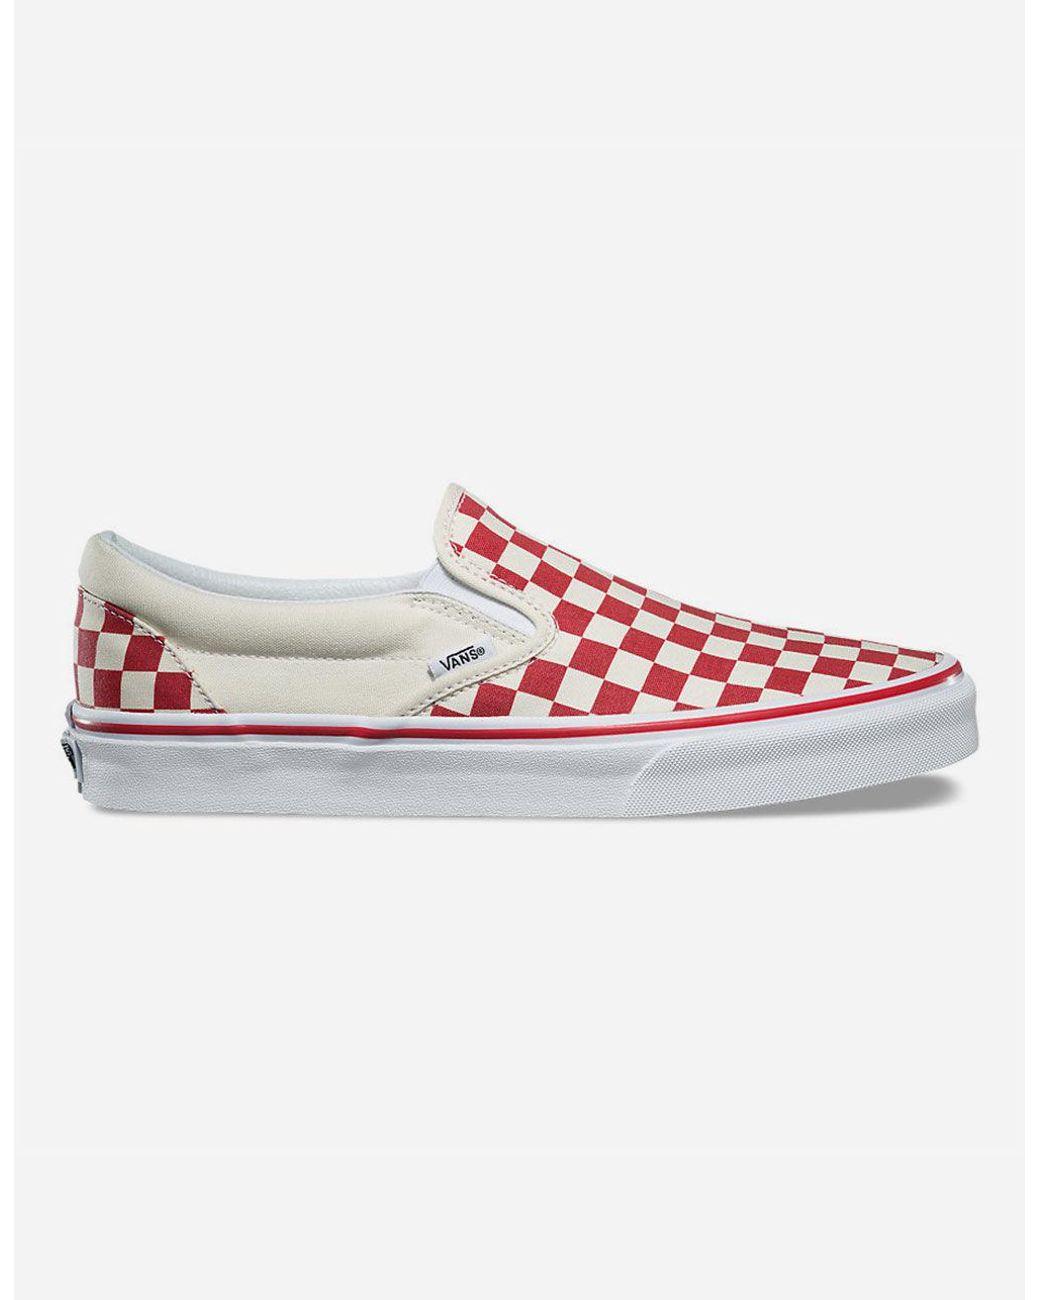 White Women's Slip Shoes Check Primary On Redamp; J3T1uKlc5F